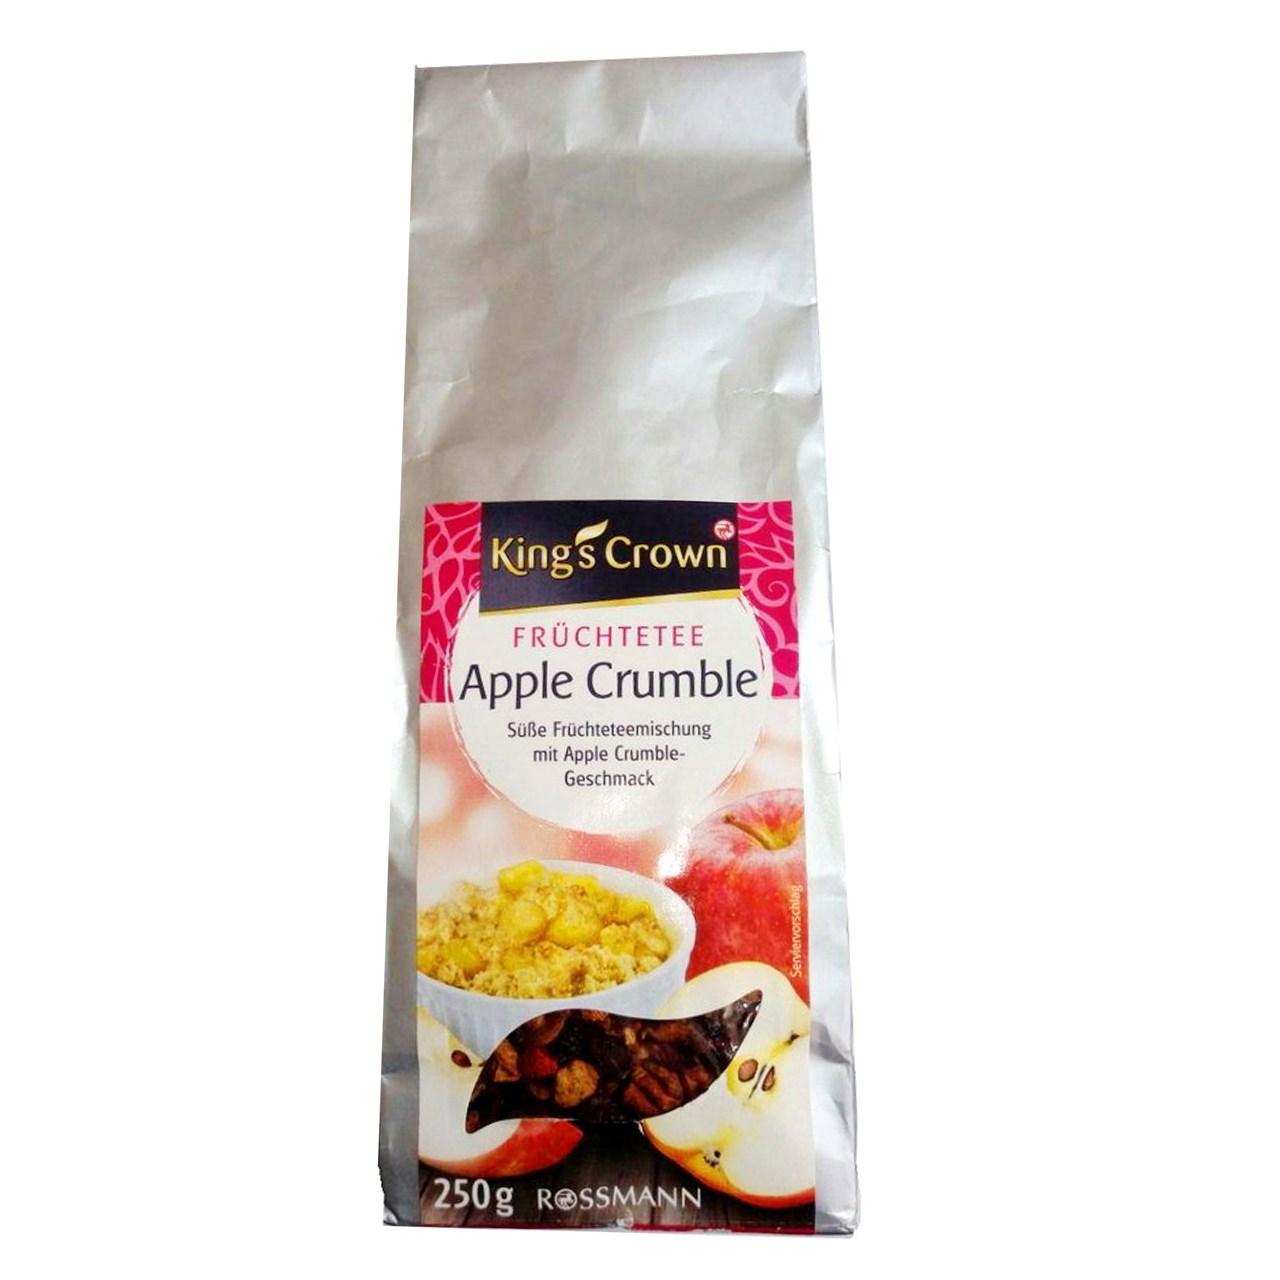 بسته چای میوه ای کینگز کرون مدل Apple Crumble